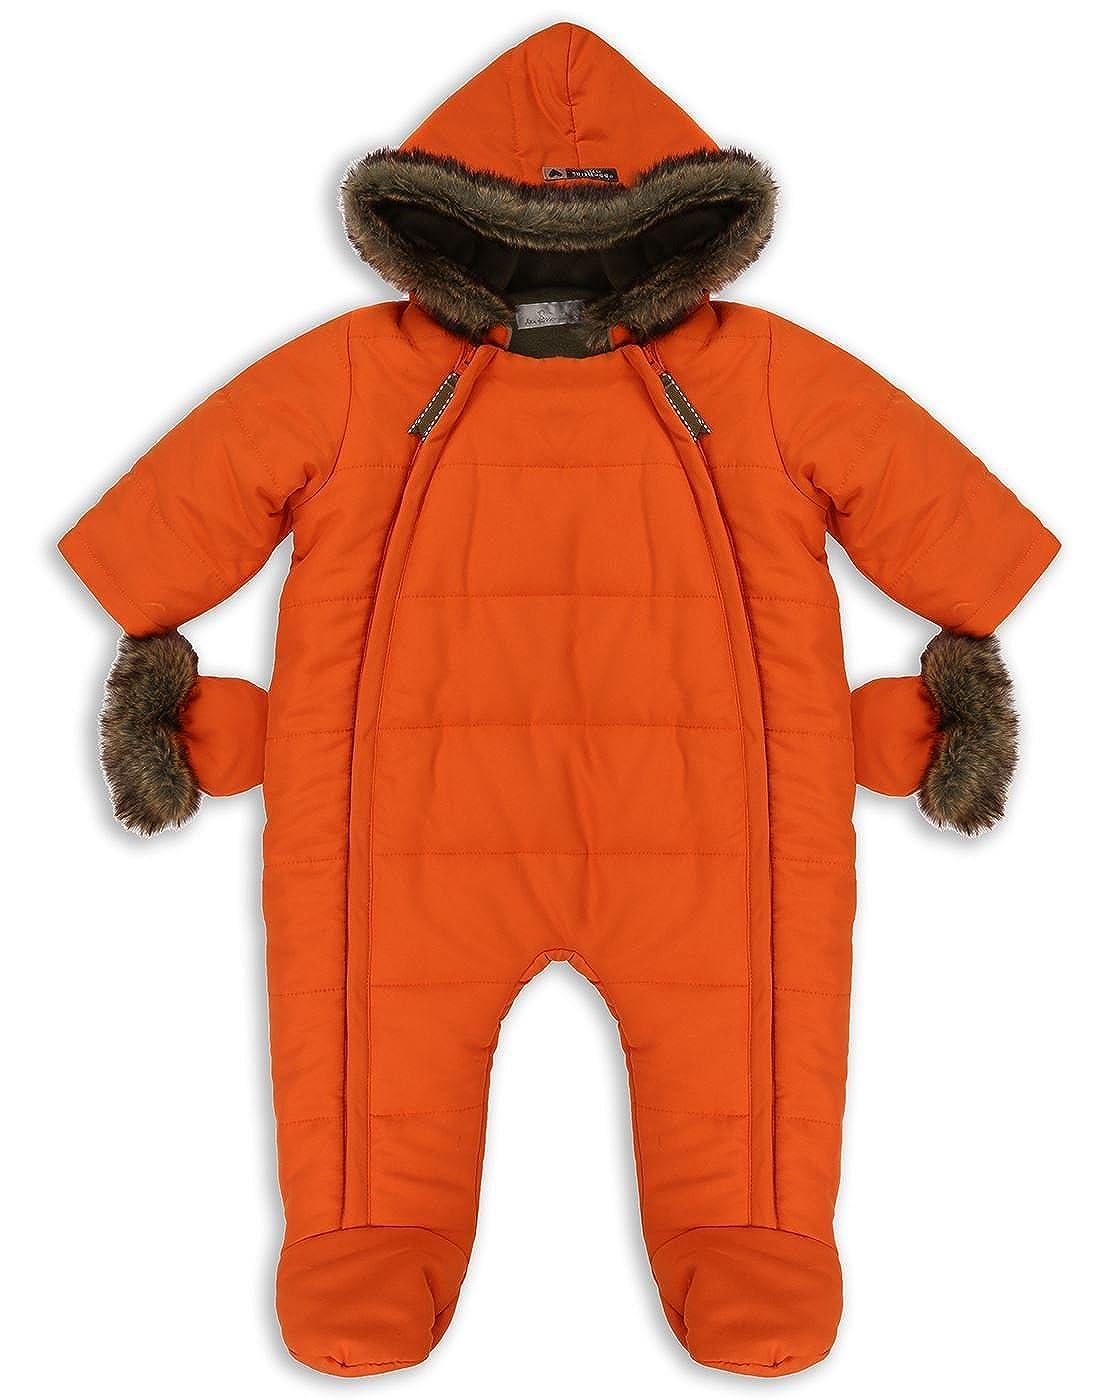 The Essential One - Bebé Pelaje Sintética Snowsuit / Traje de Esquí - Naranja - EO259